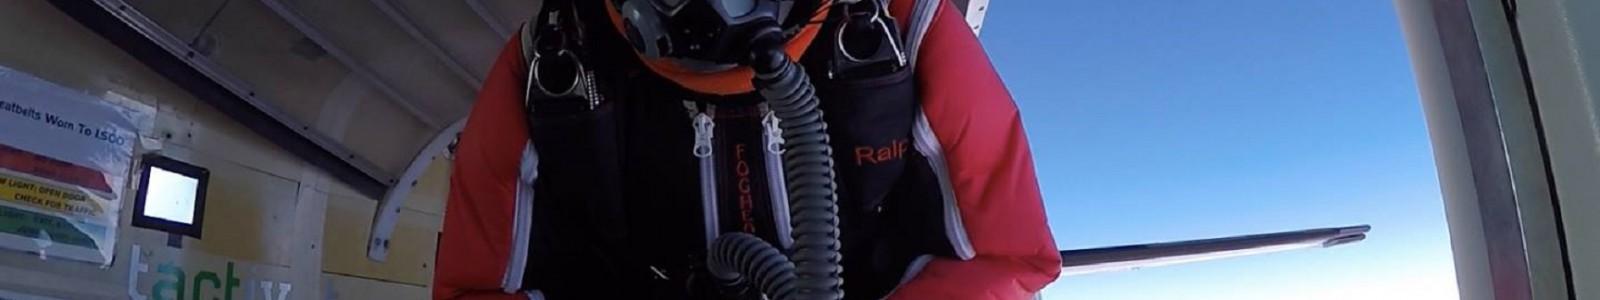 Ralph-7